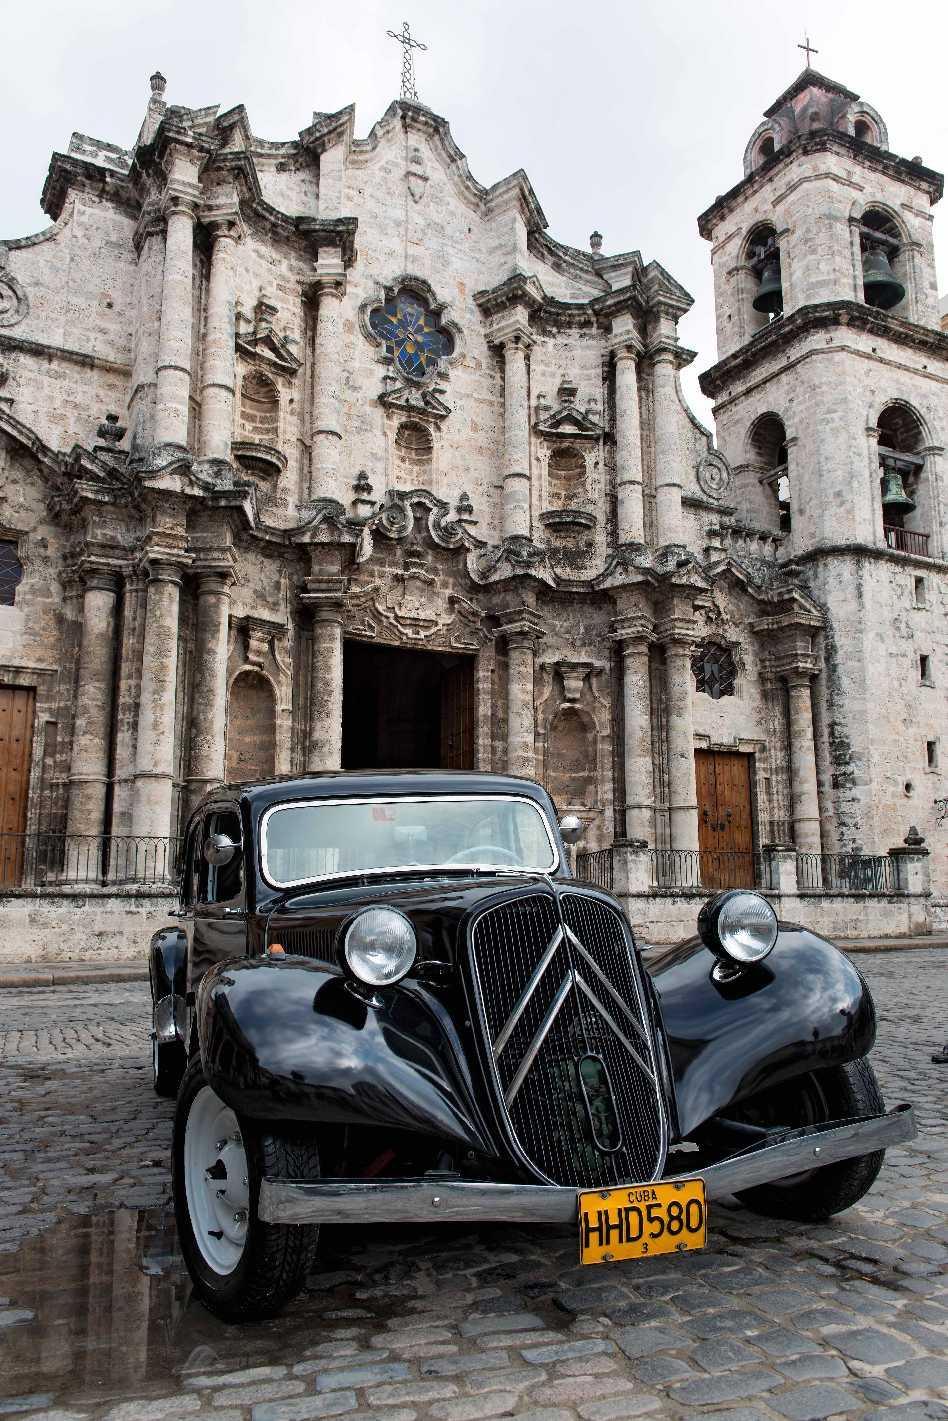 Havana, Autos & Architecture  - CA2 2013 DSC8370 36